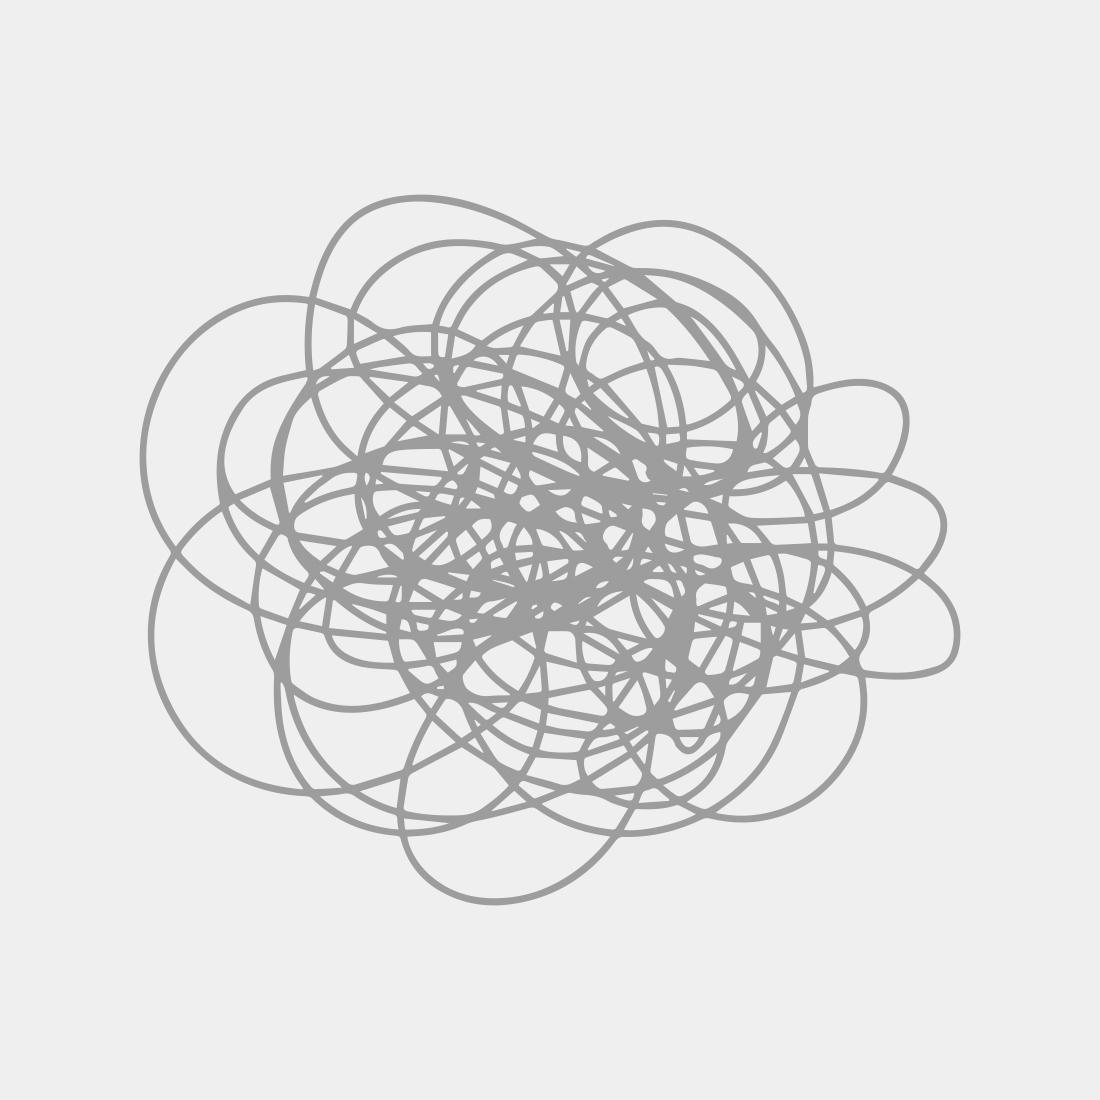 Albert Irvin OBE RA Untitled opus w.23 (framed)